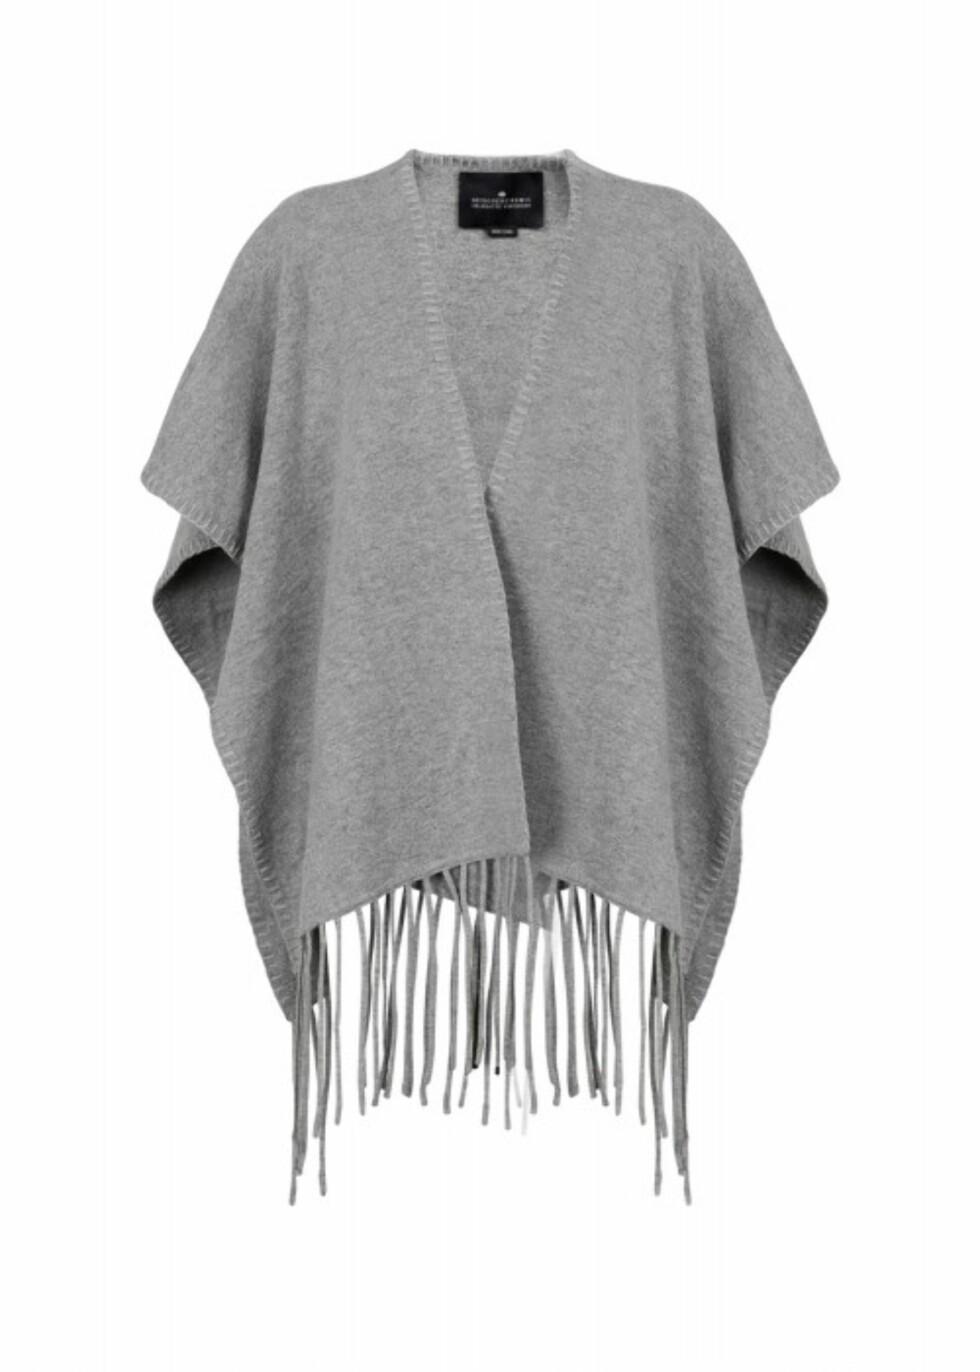 Poncho fra Designers Remix | kr 2800 | https://www.designersremix.com/no/blanket-42485.html